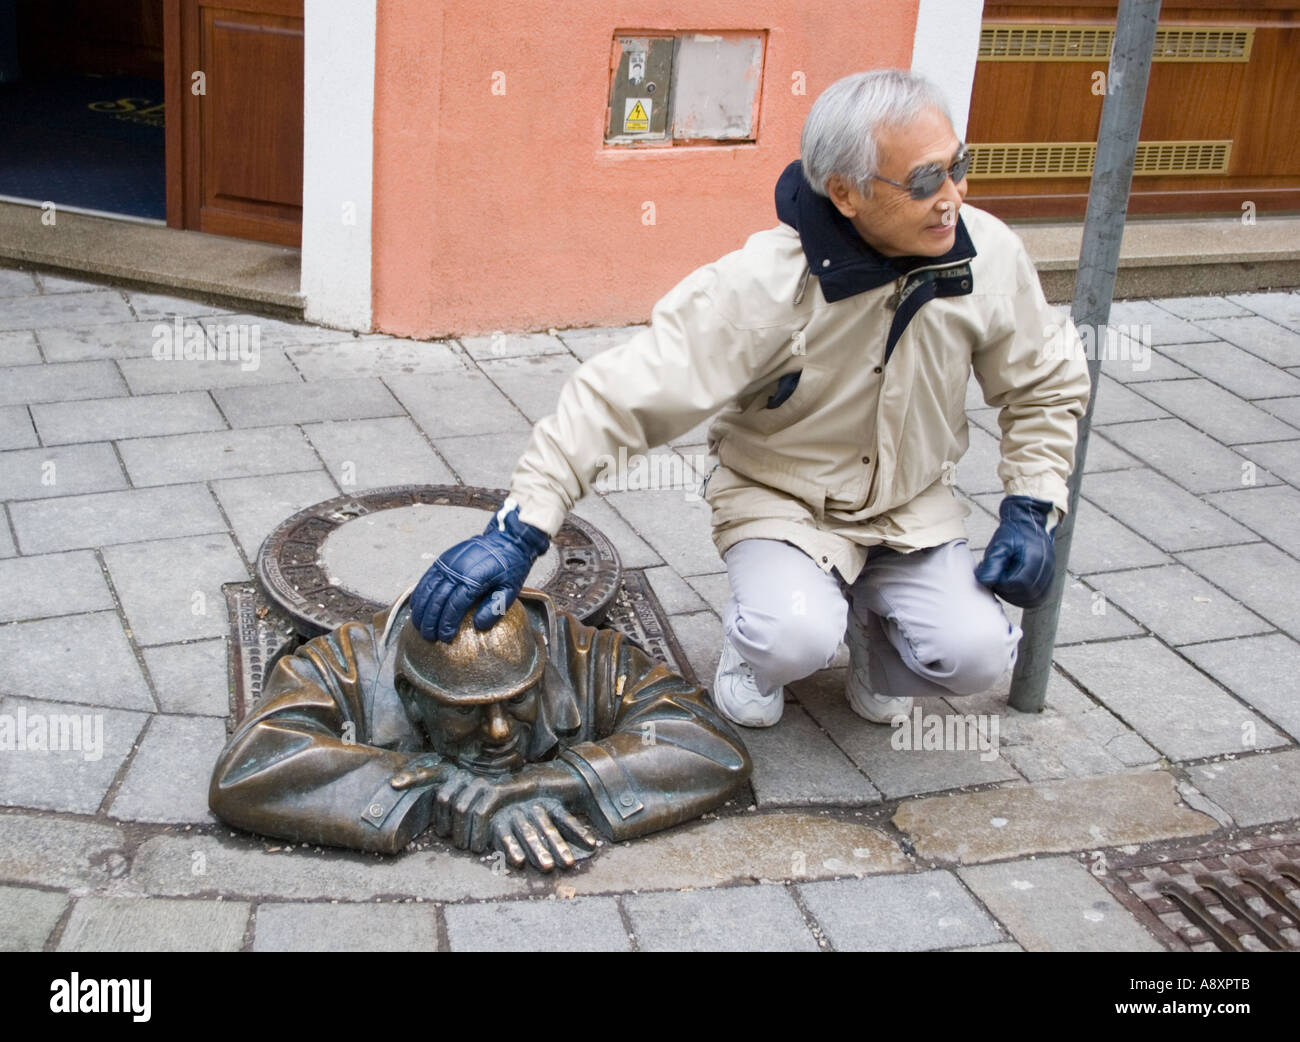 Calle escultura en Bratislava. Foto de stock